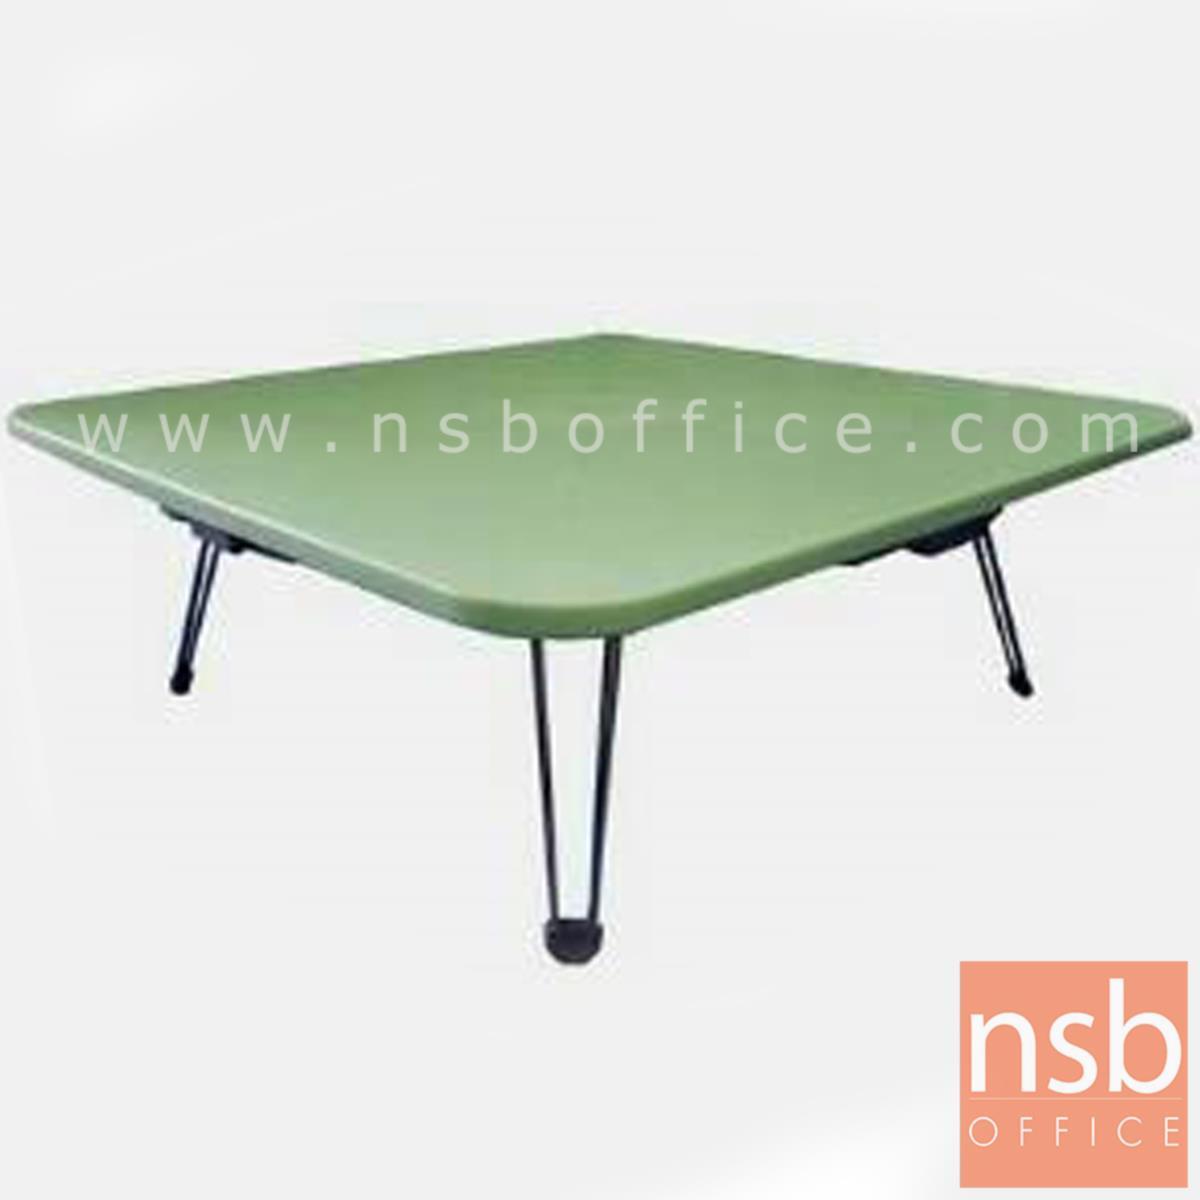 A19A050:โต๊ะญี่ปุ่นทรงเหลี่ยม รุ่น HOLSTEIN (โฮลชไตน์ ) ขนาด 80W cm. ขาเหล็กชุบโครเมี่ยม